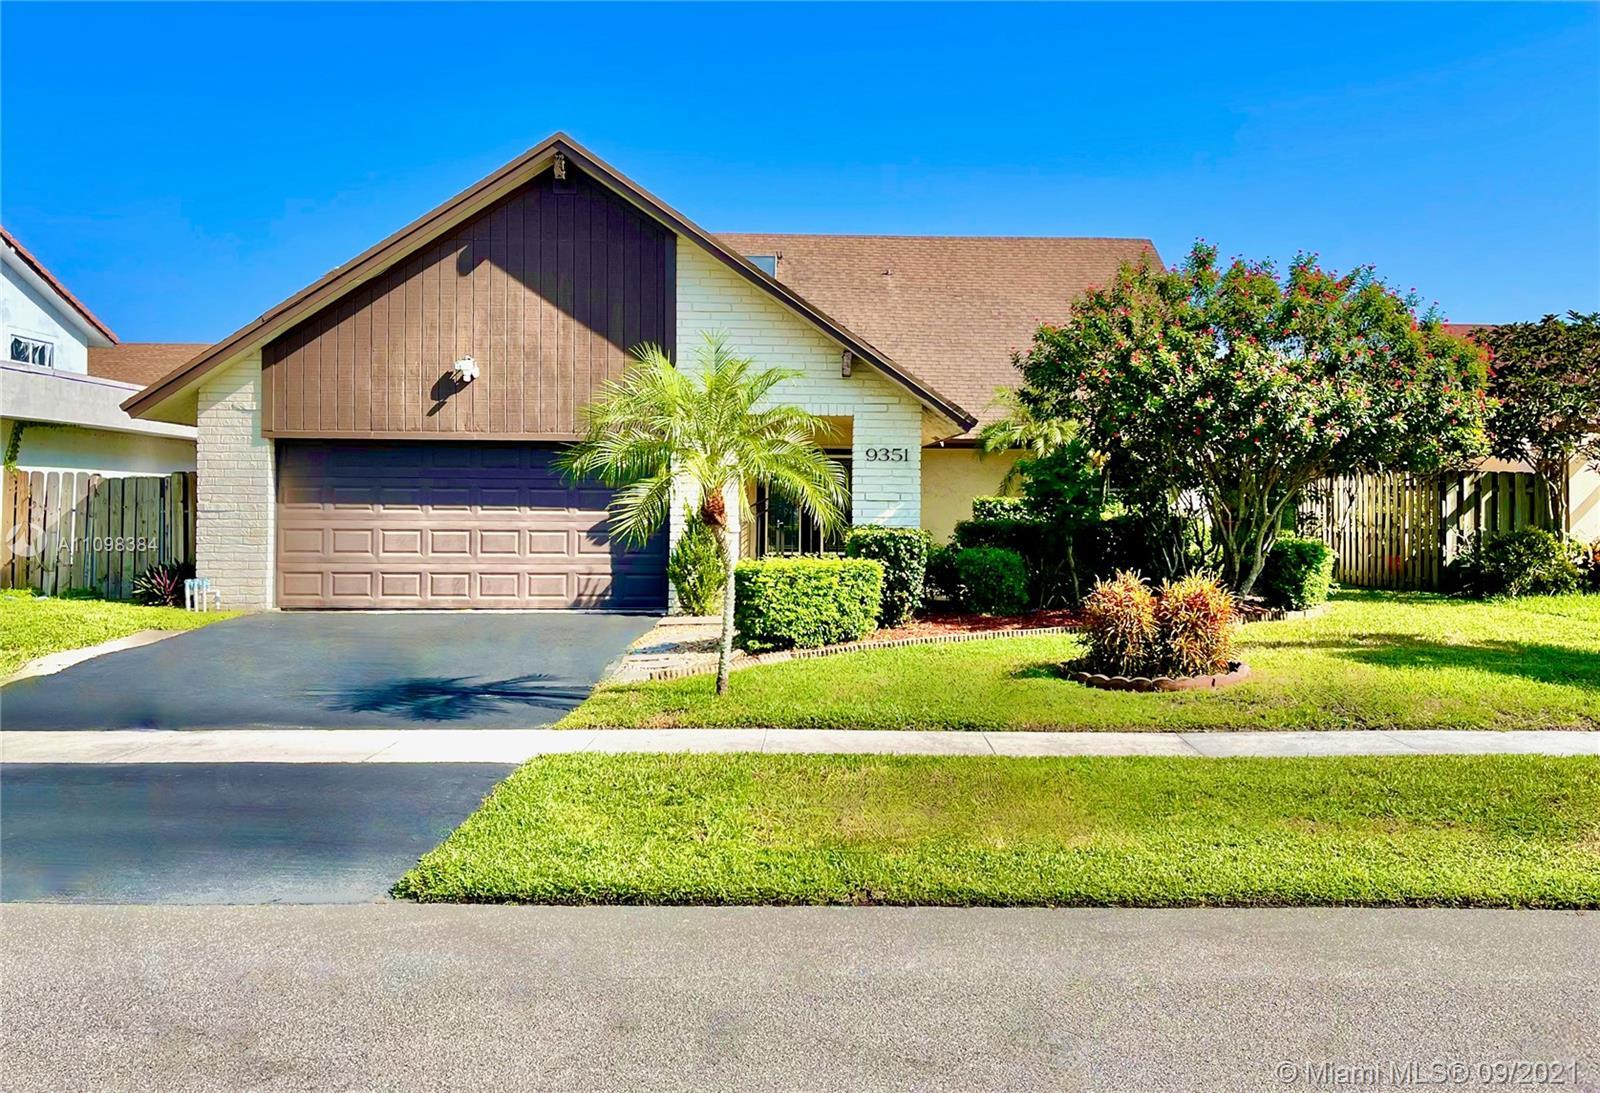 9351 37th Mnr, Sunrise, Florida 33351